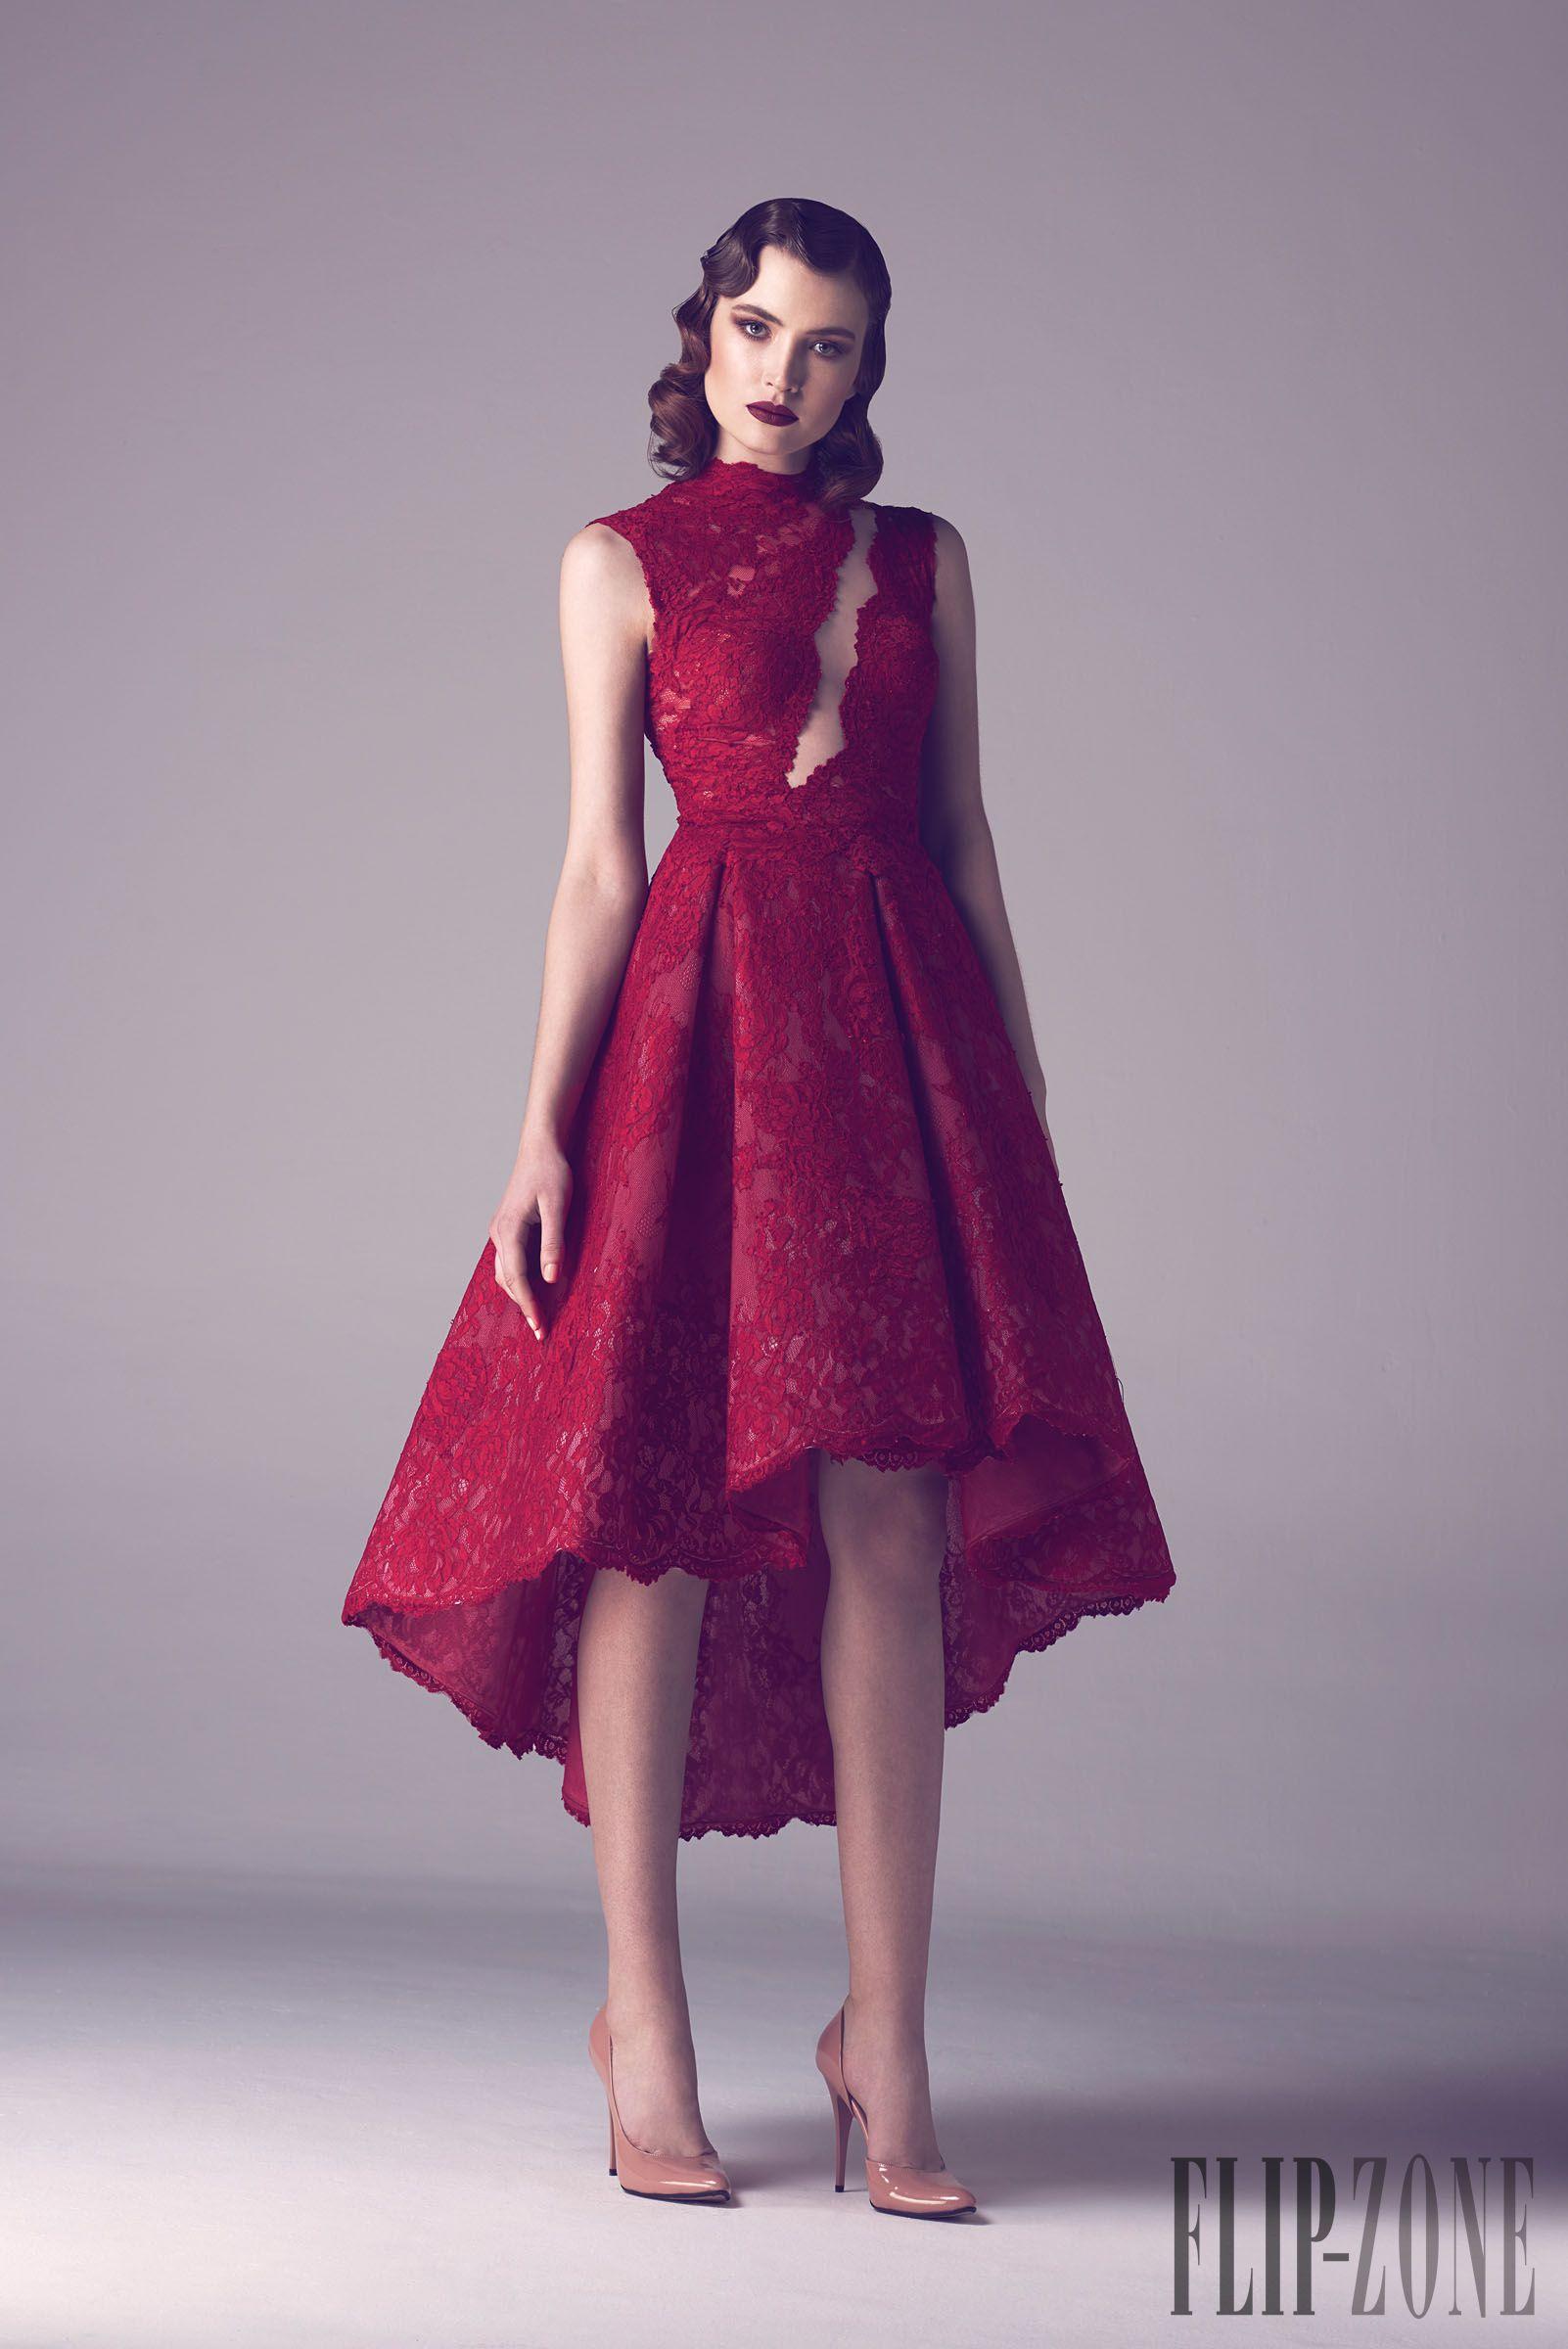 Vistoso Vestido De Fiesta En Rojo Viñeta - Vestido de Novia Para Las ...